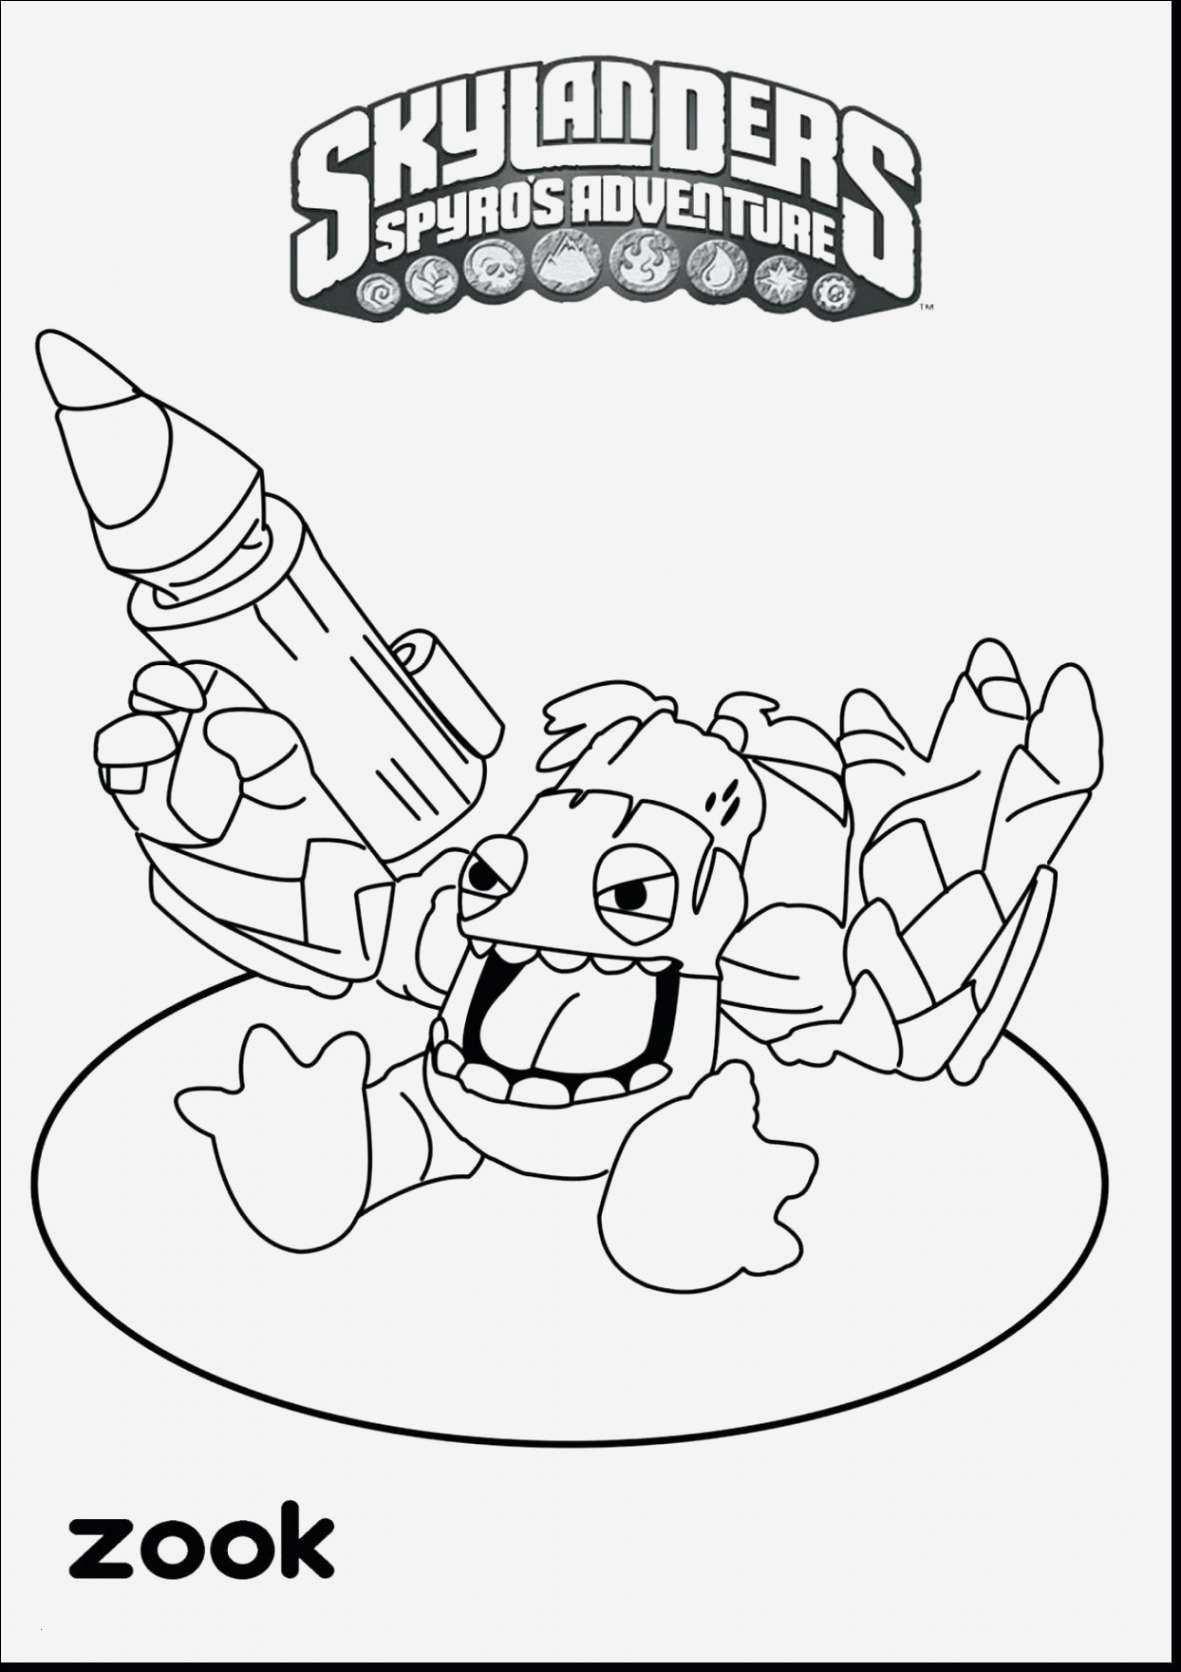 Monster High Bilder Zum Ausdrucken Neu Bilder Zum Ausdrucken Monster High Vorstellung – Ausmalbilder Ideen Galerie